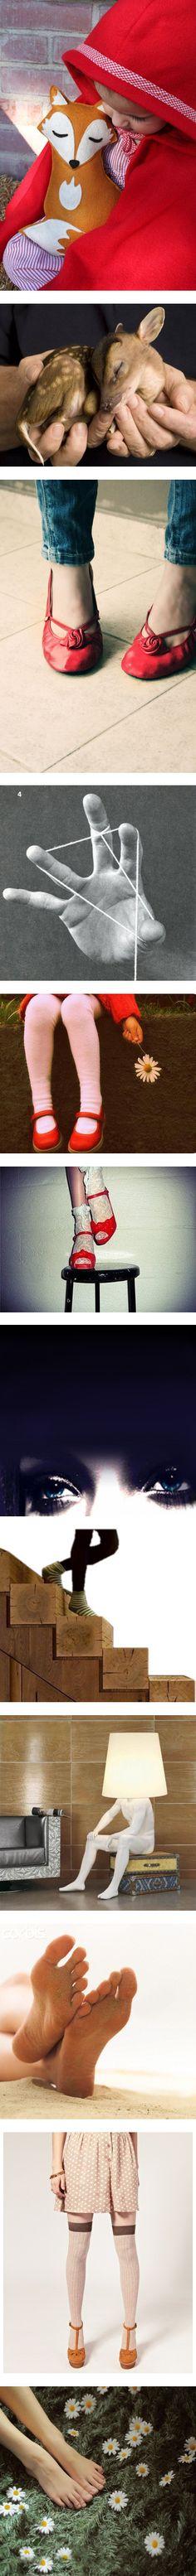 """photography"" by little-dojinbar on Polyvore"